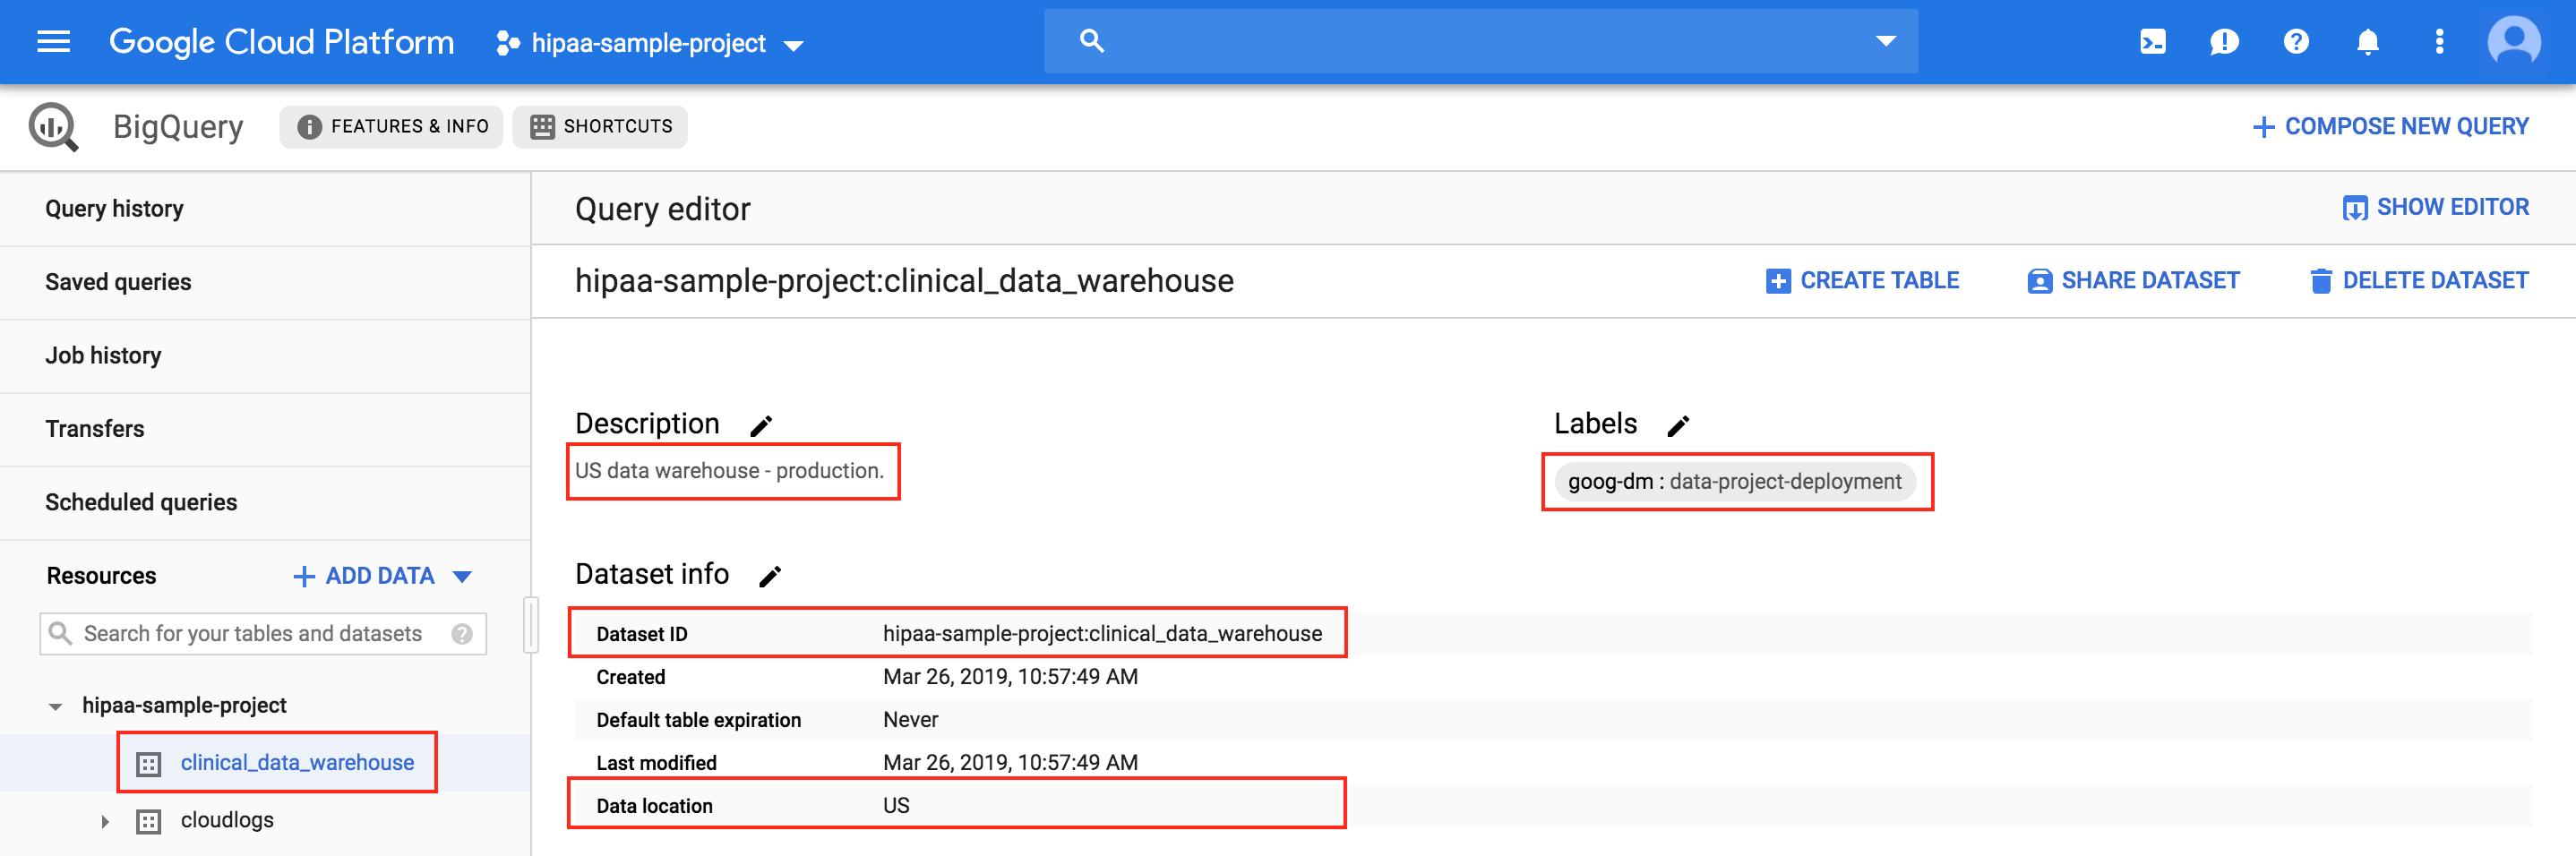 BigQuery는 새로 생성된 데이터 세트를 표시함